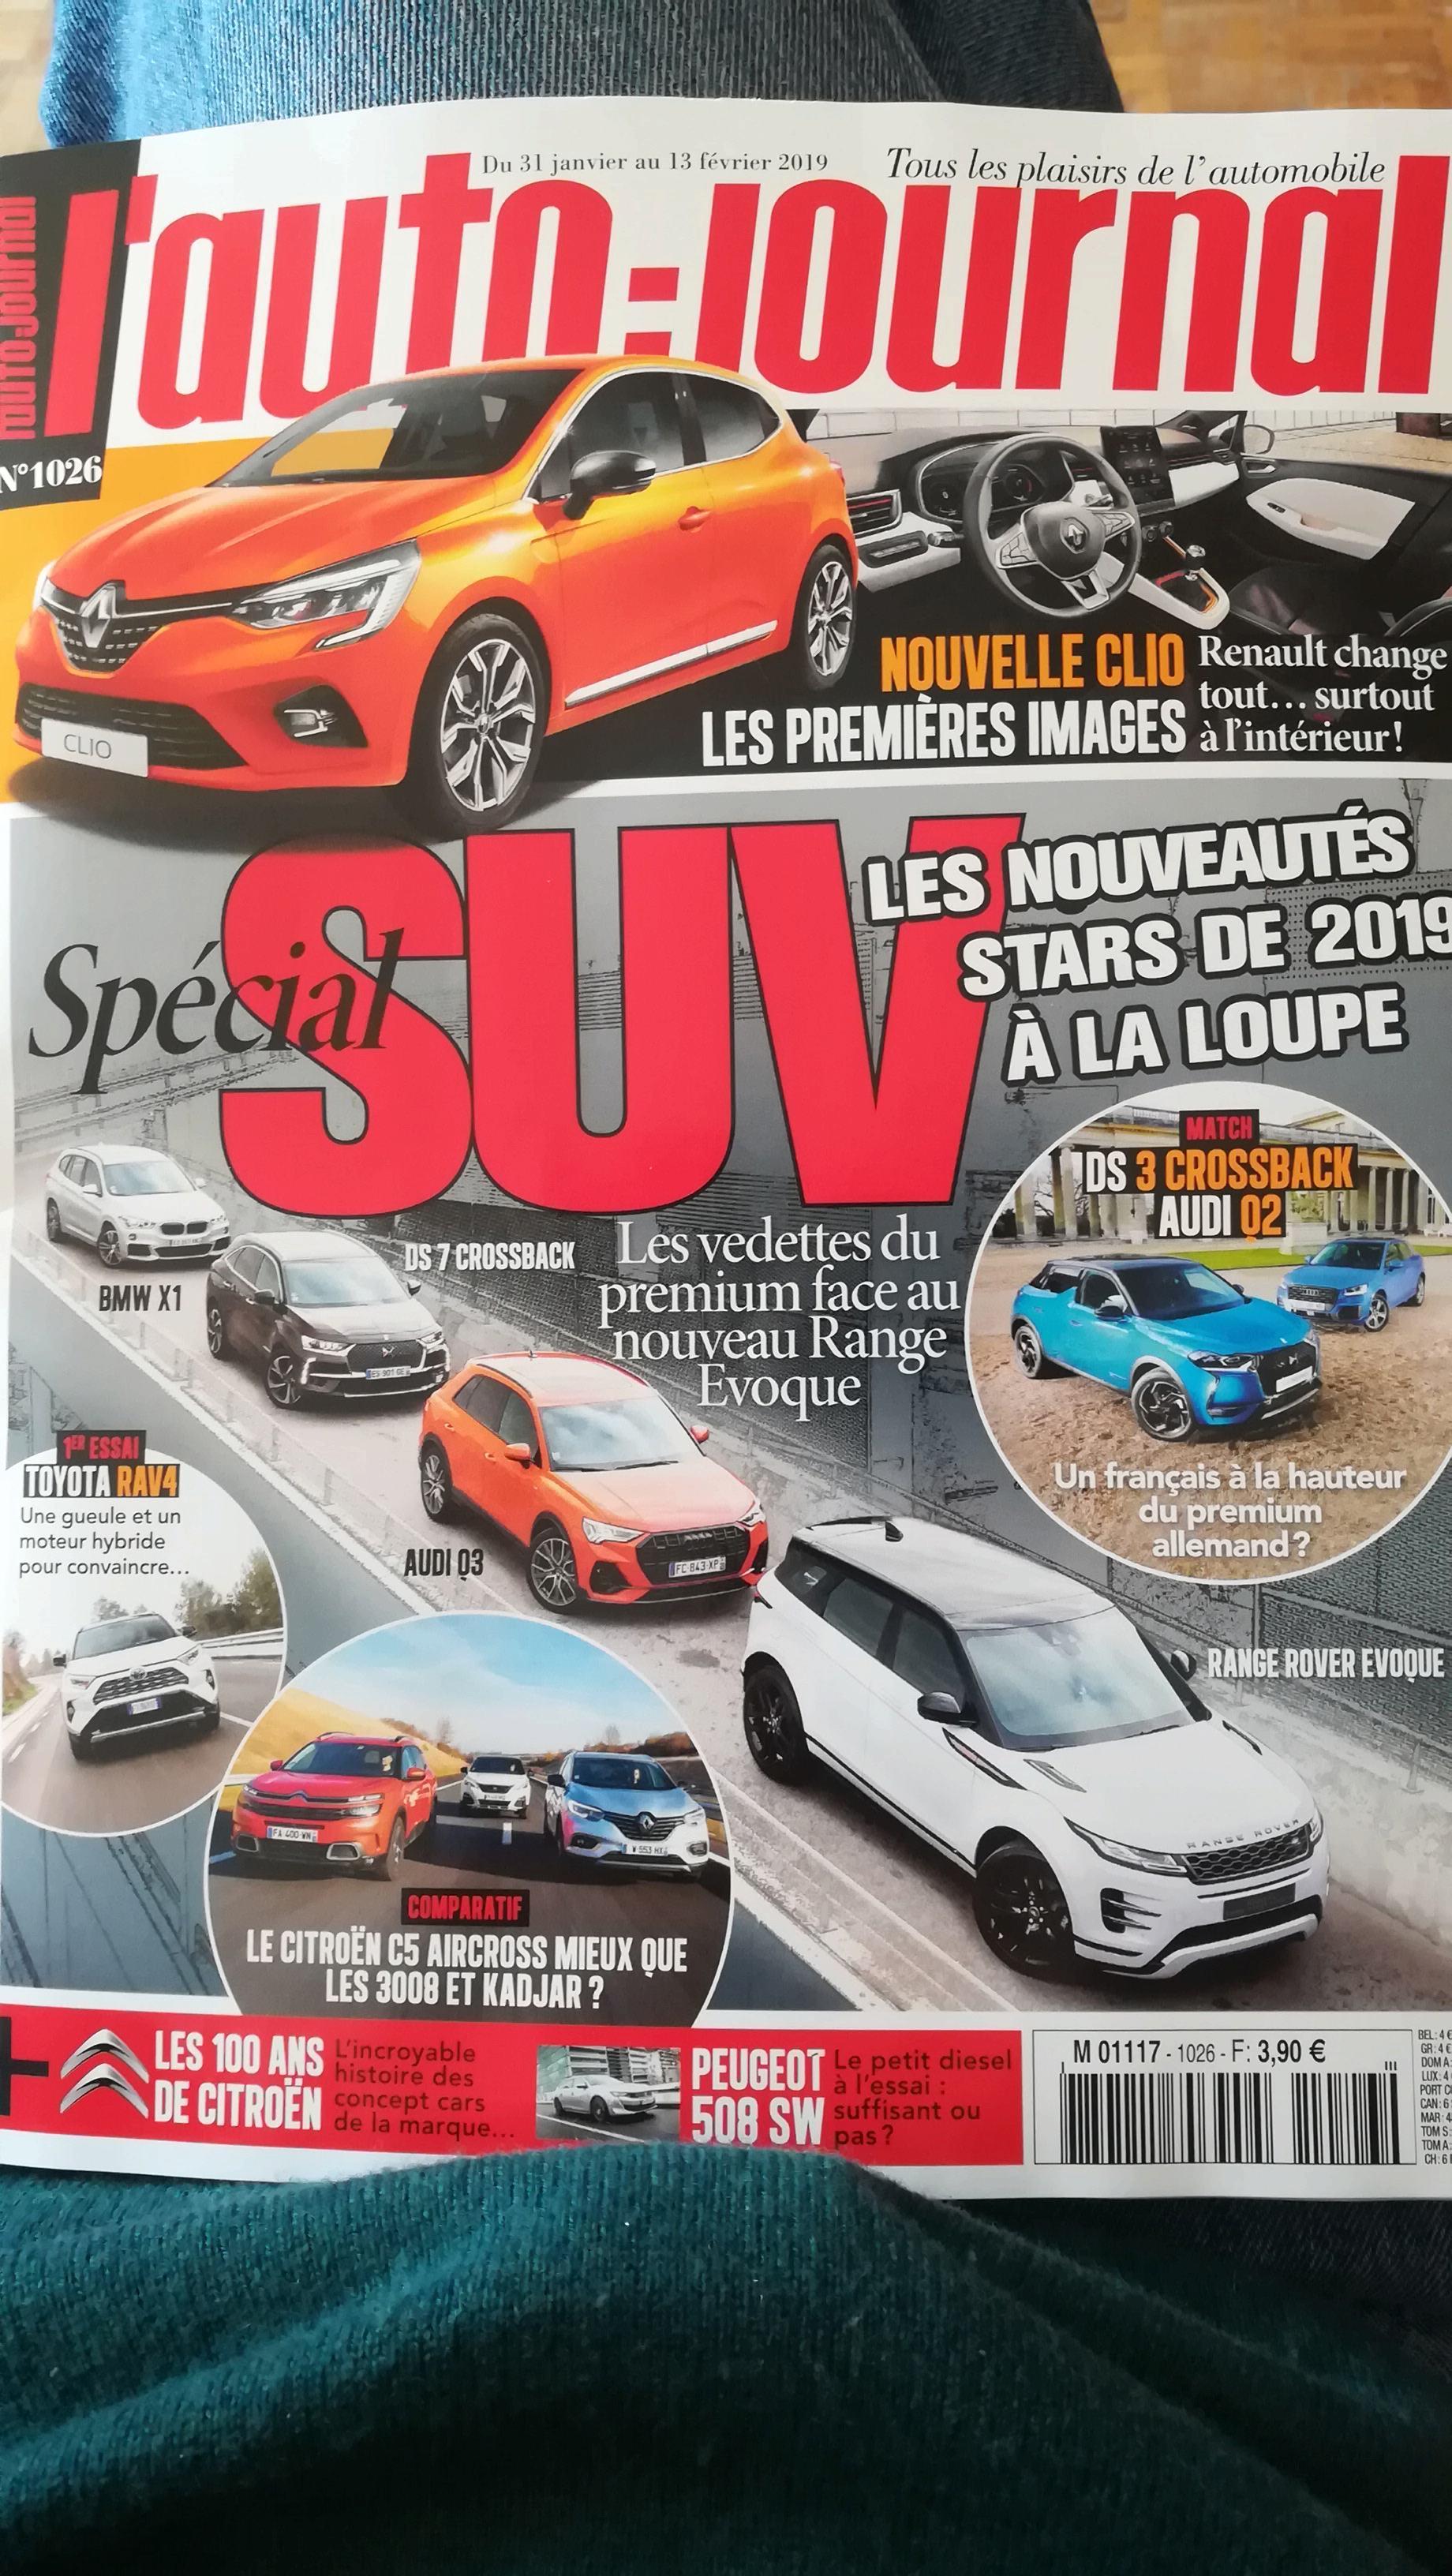 [Presse] Les magazines auto ! - Page 13 Img_2072